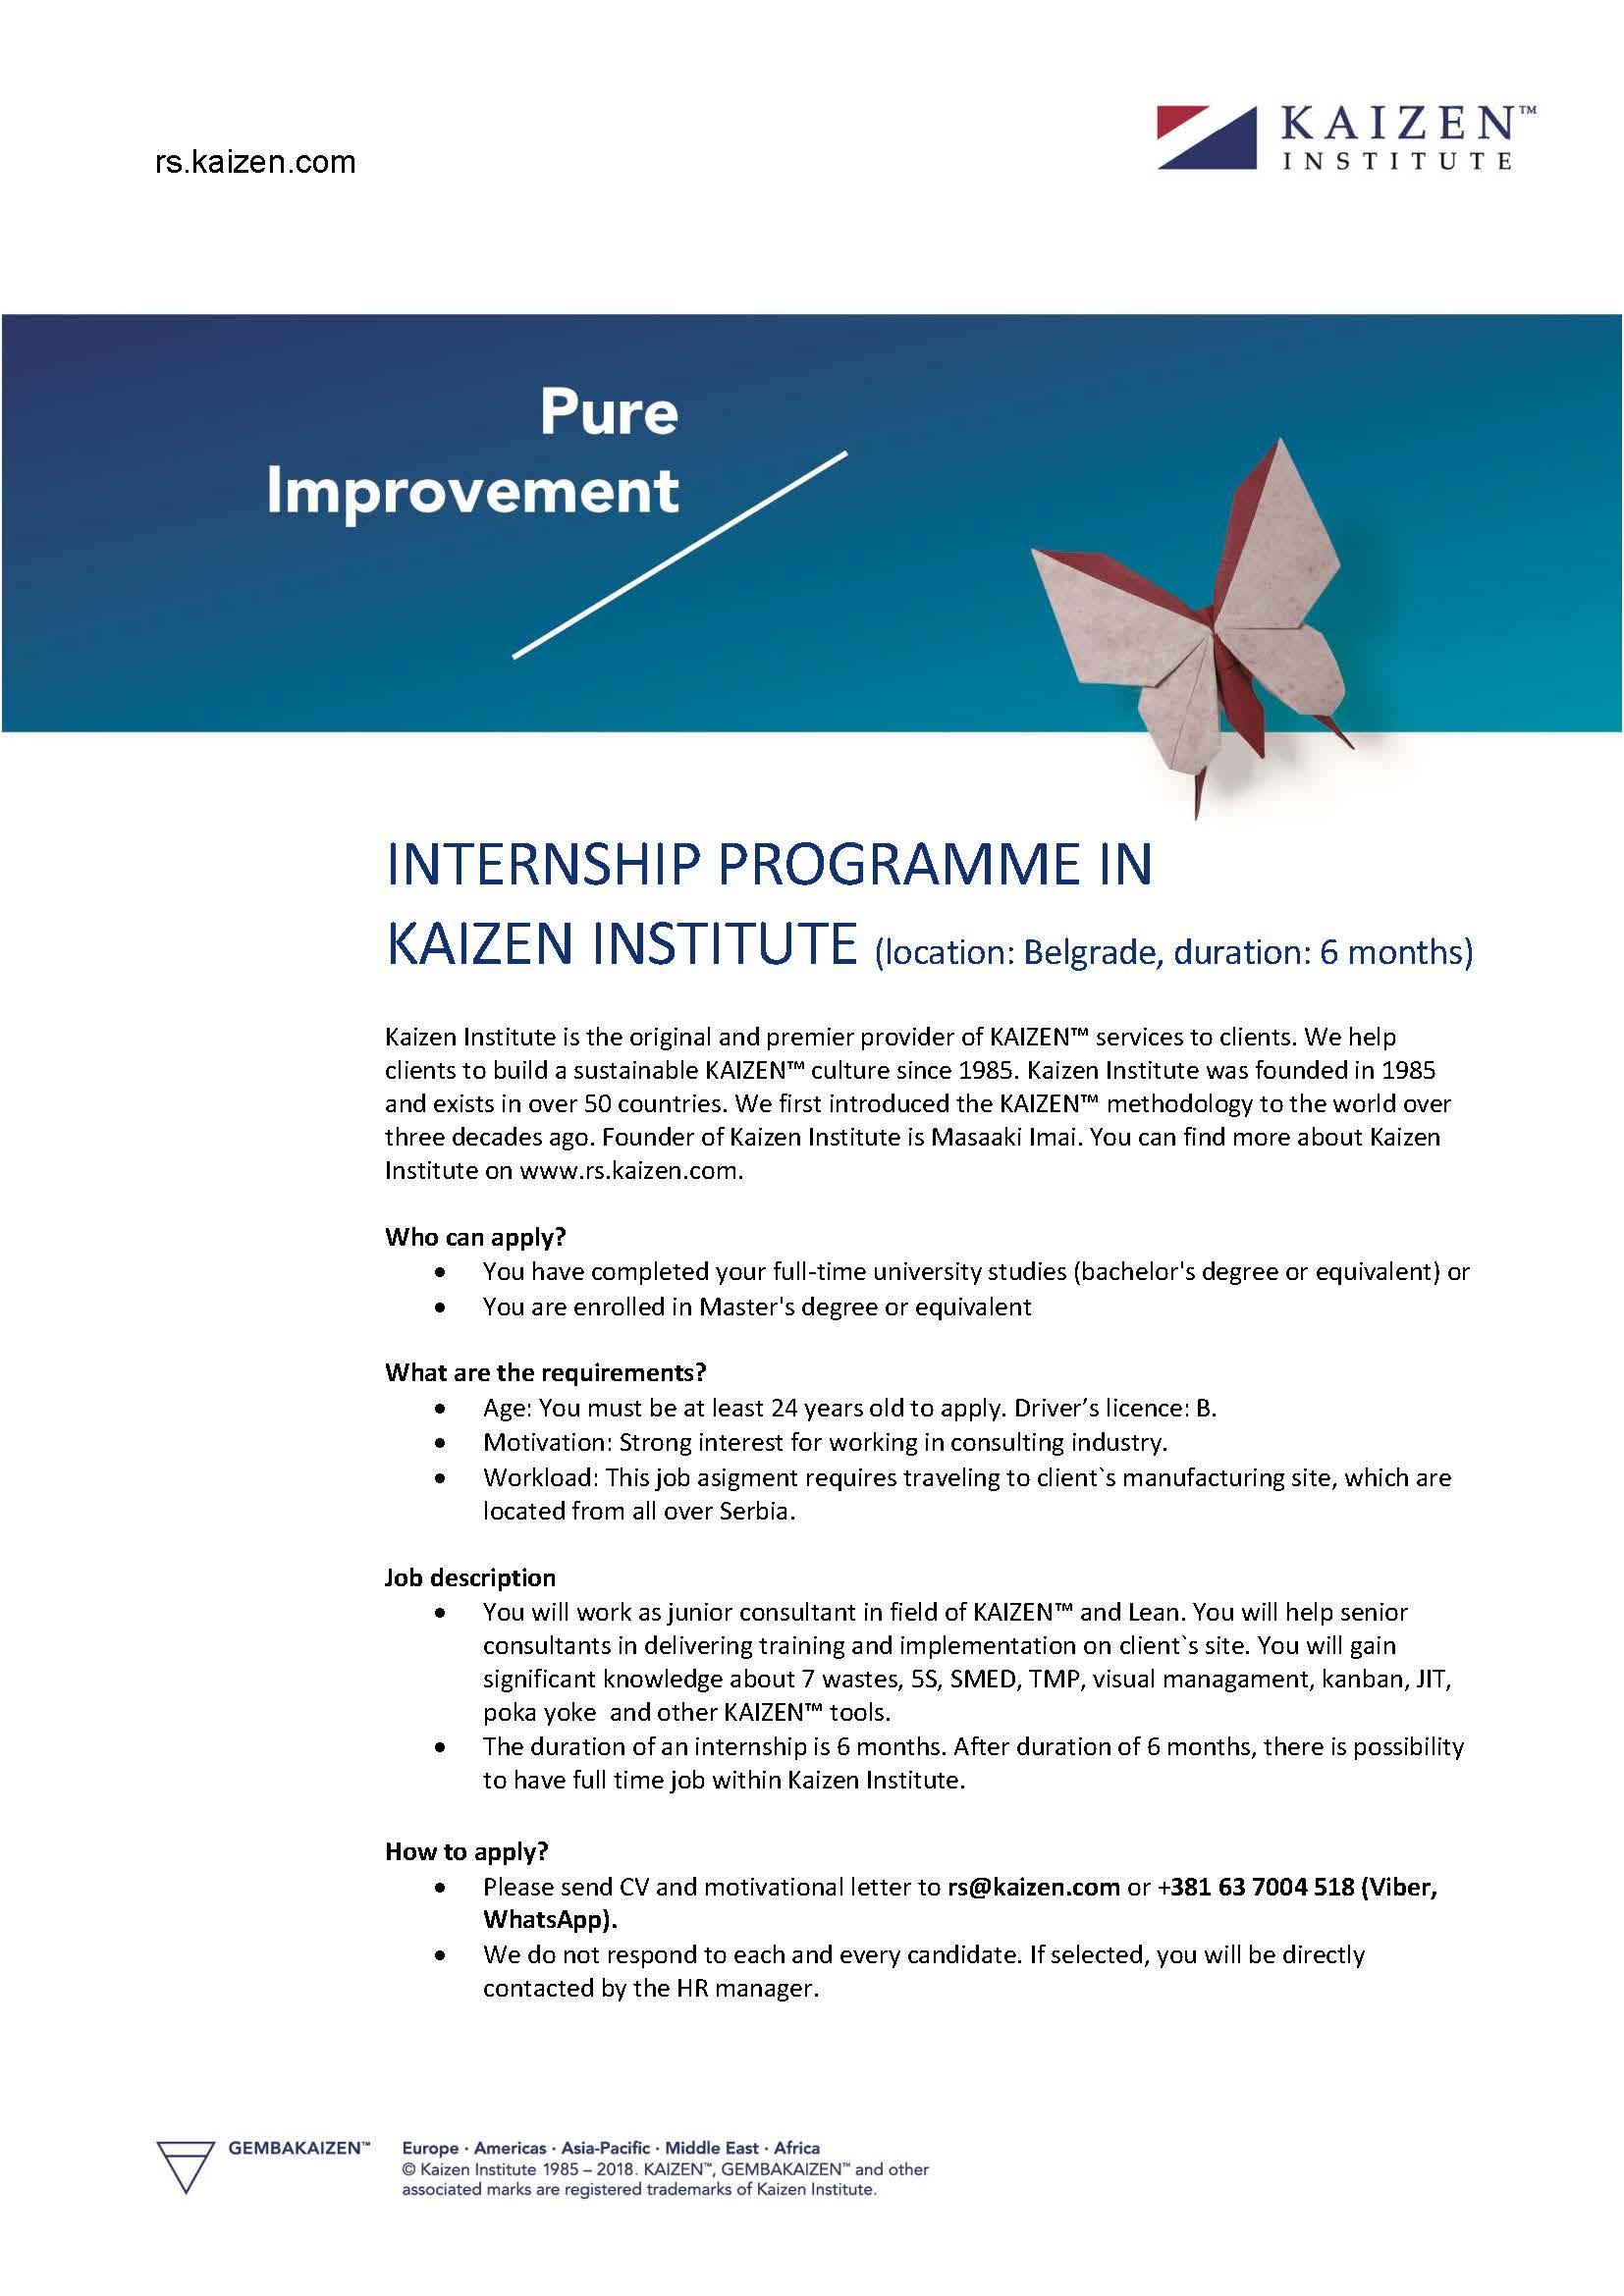 2019-01-13 KAIZEN internship (1)